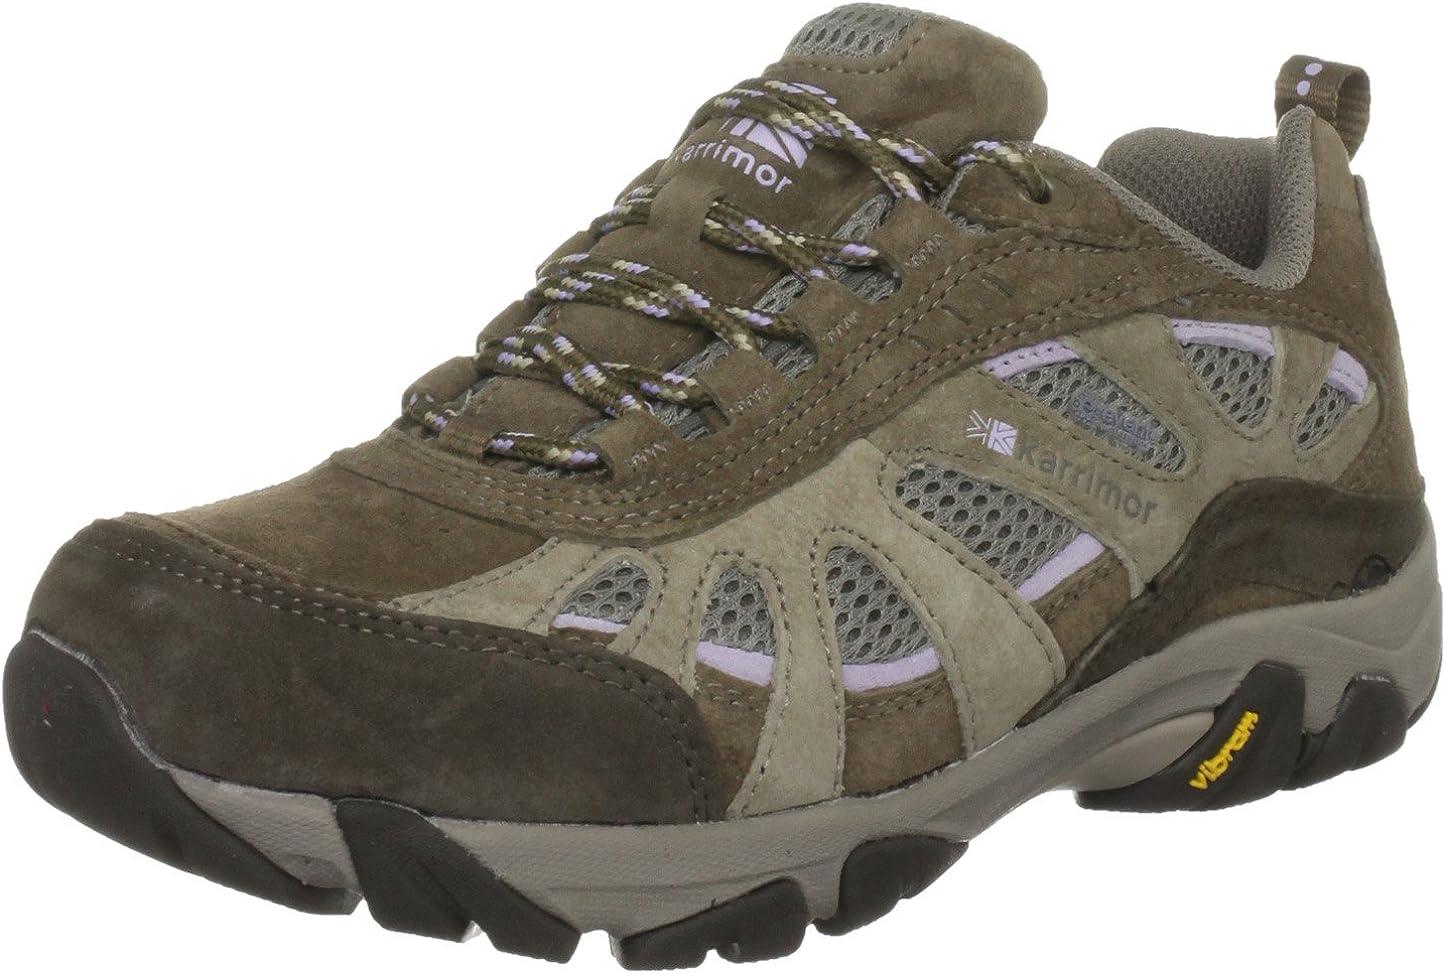 Serenity Low Ladies Event Hiking Shoe